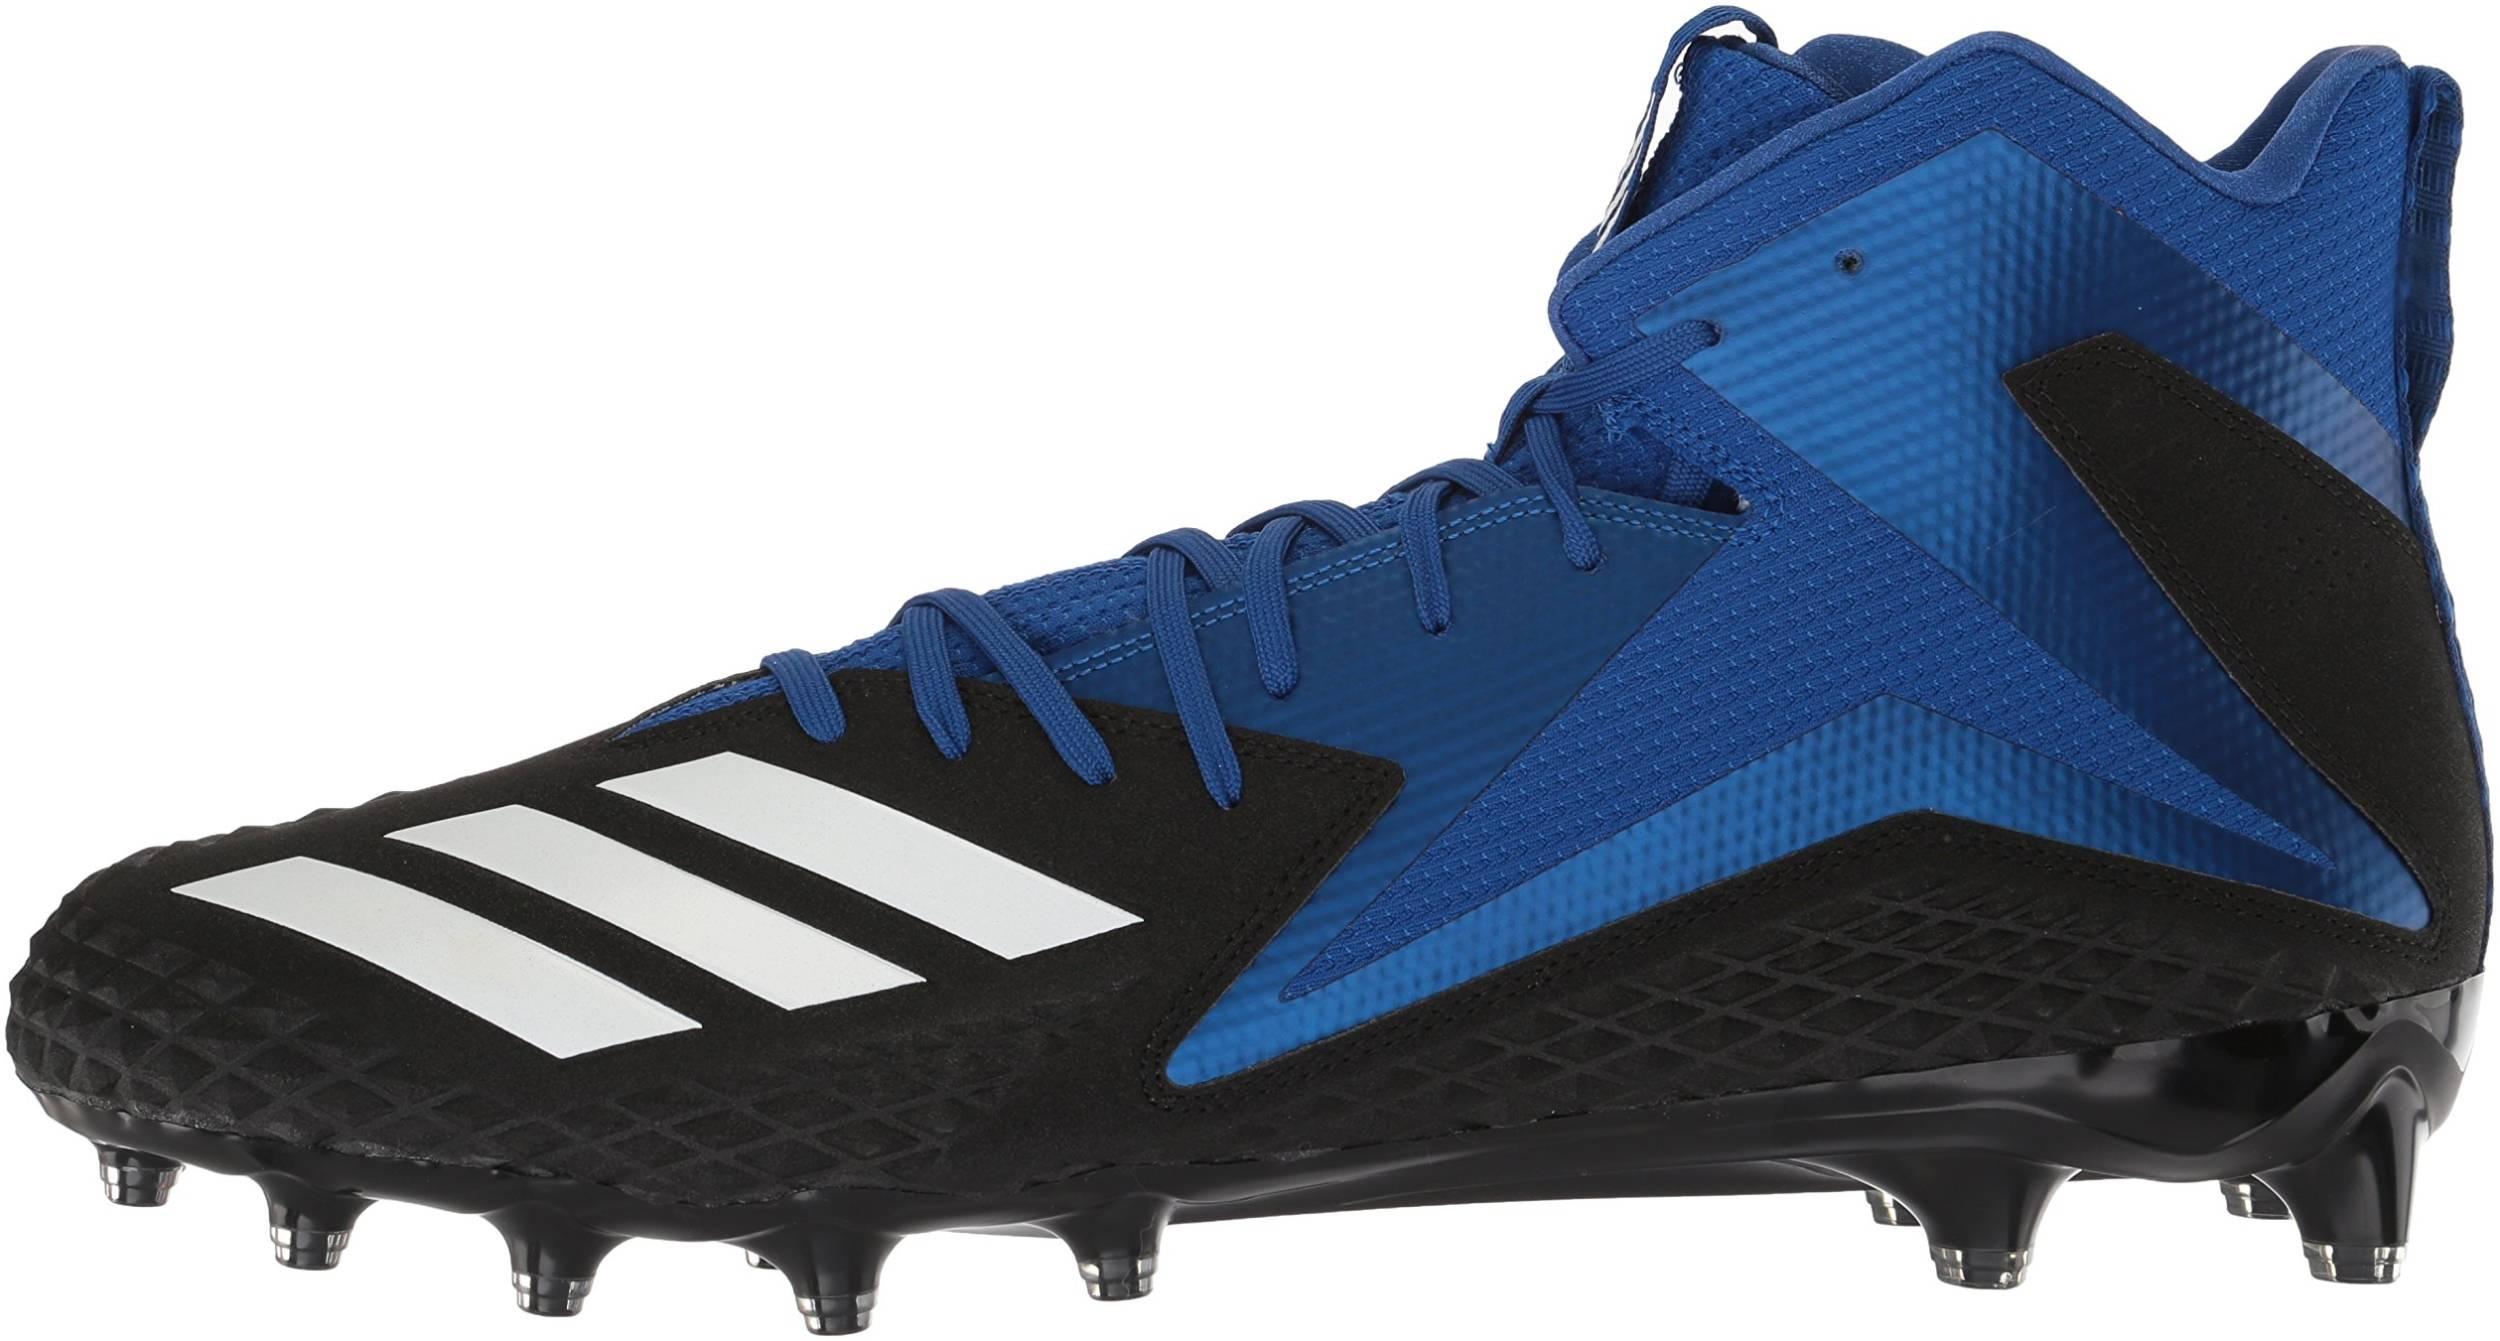 Adidas Freak X Carbon Mid